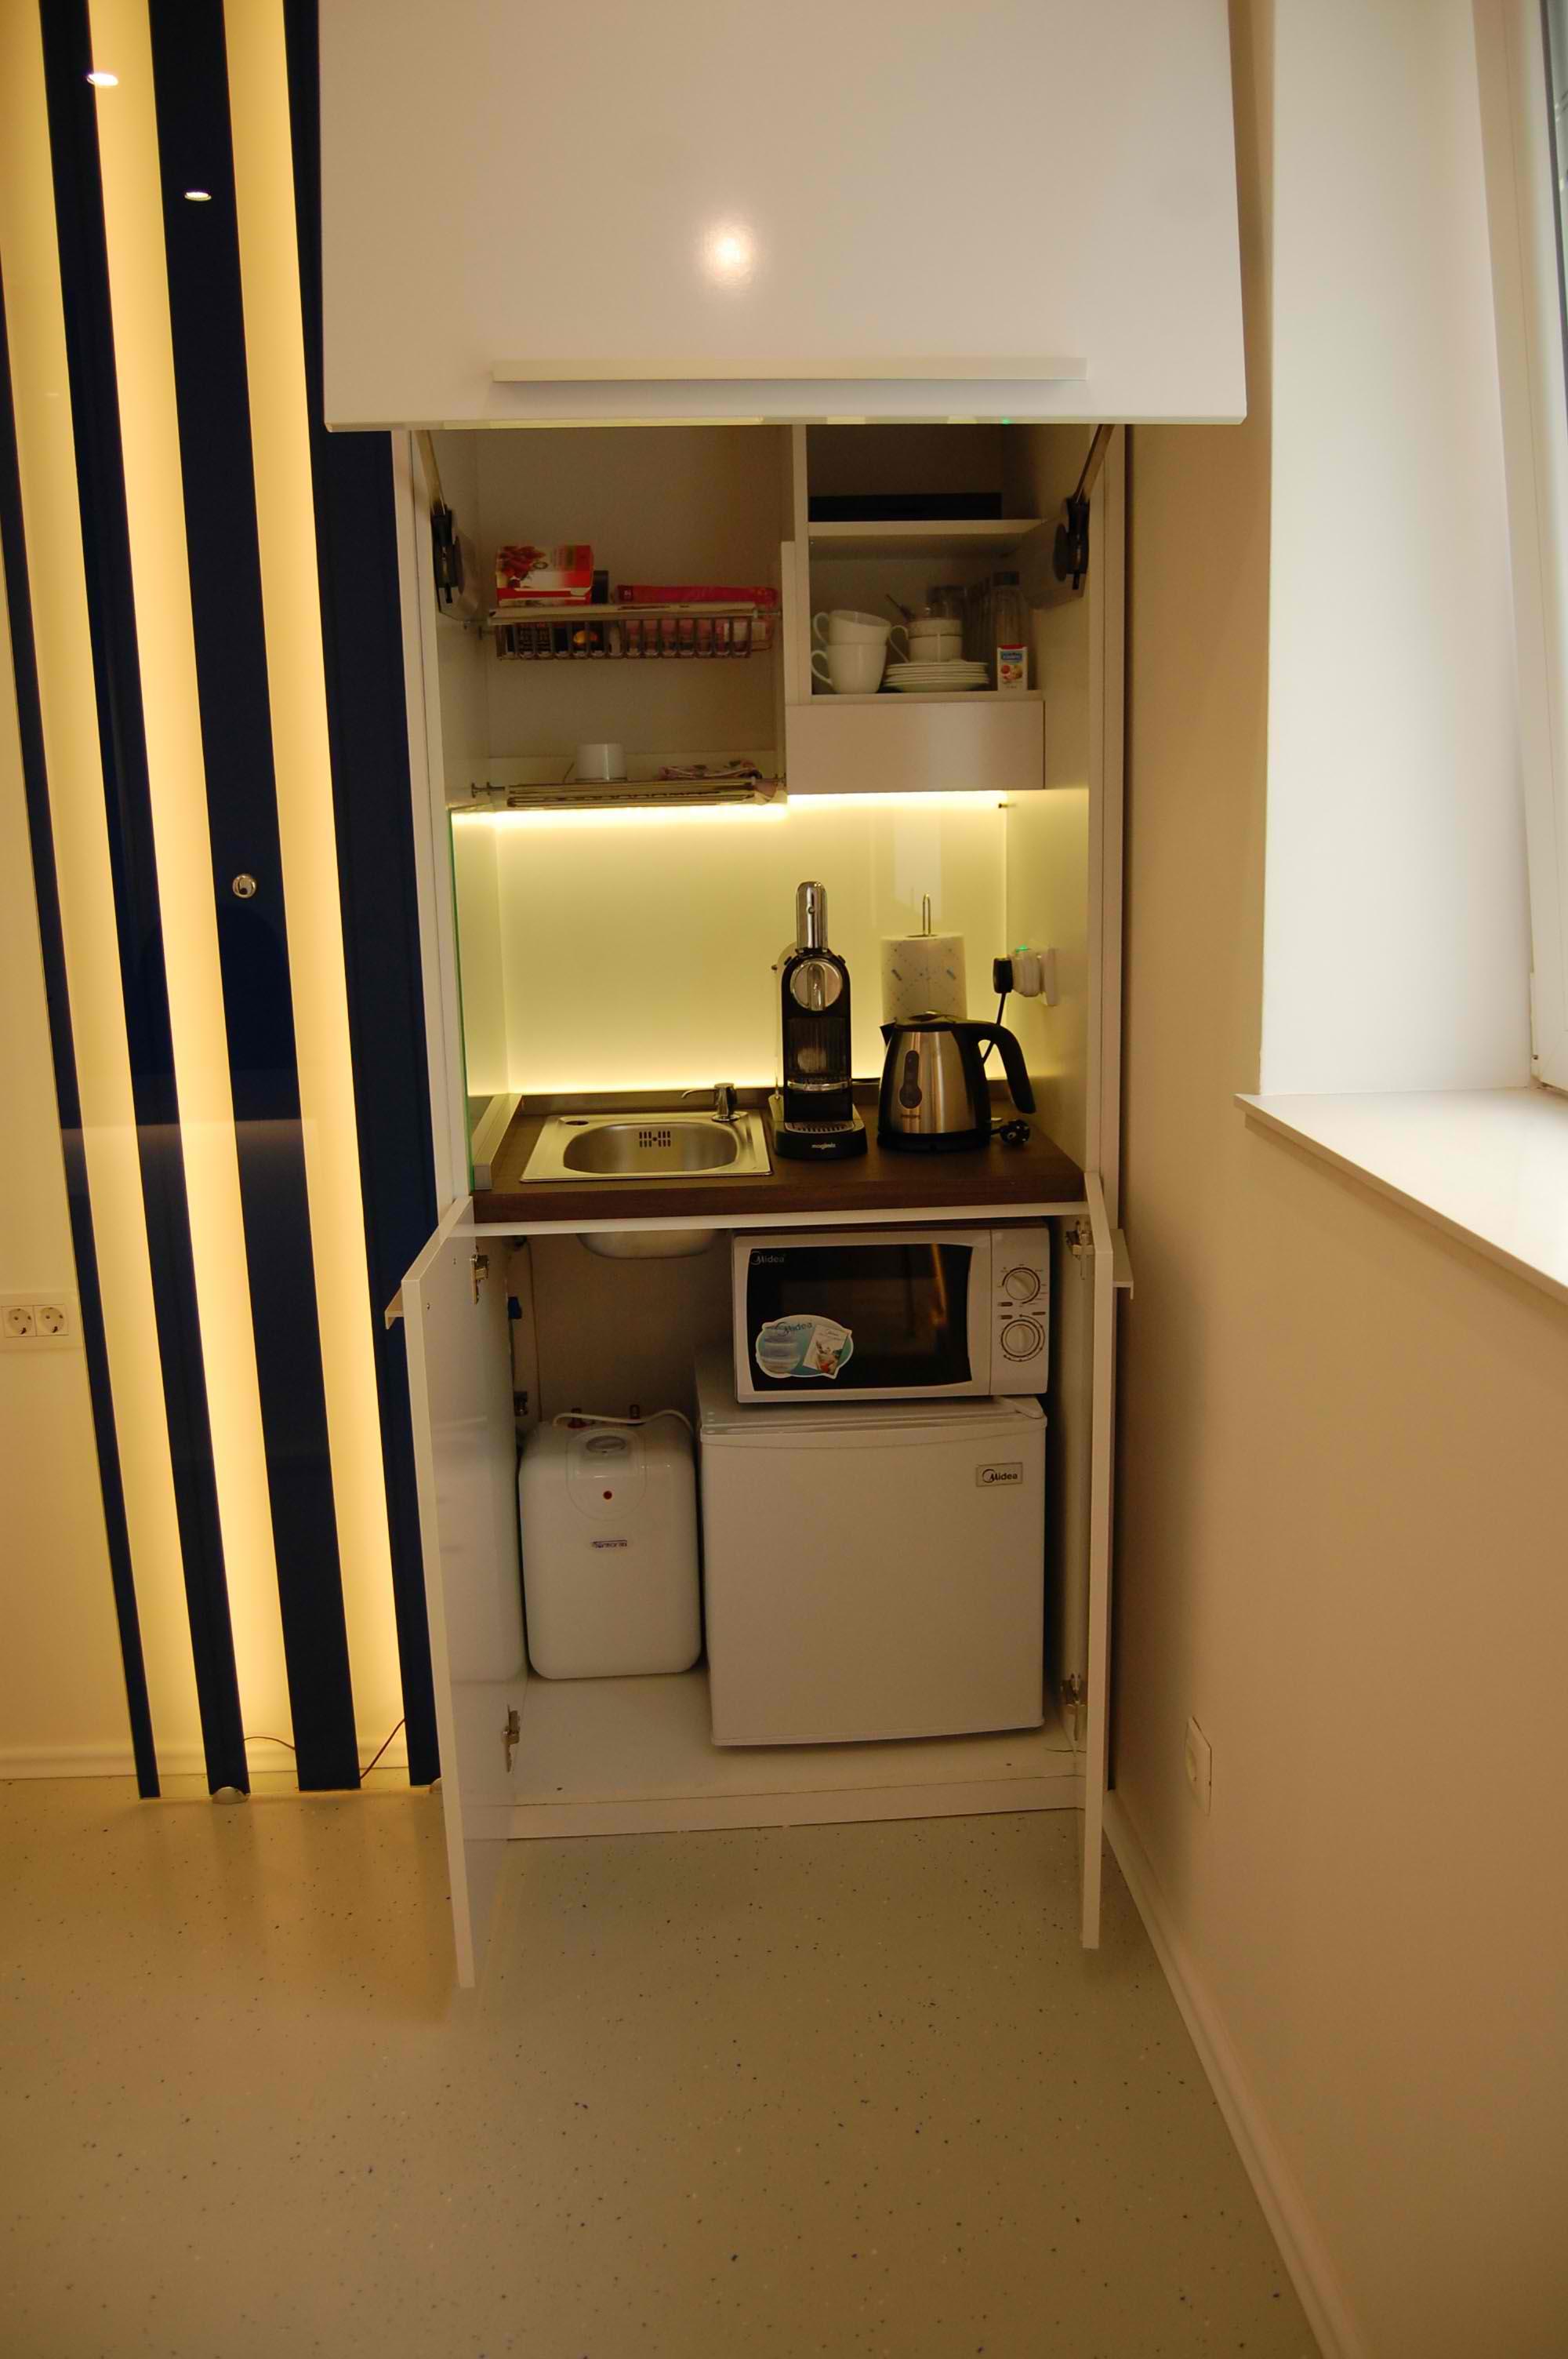 urbanenterijer kuhinje po meri beograd. Black Bedroom Furniture Sets. Home Design Ideas